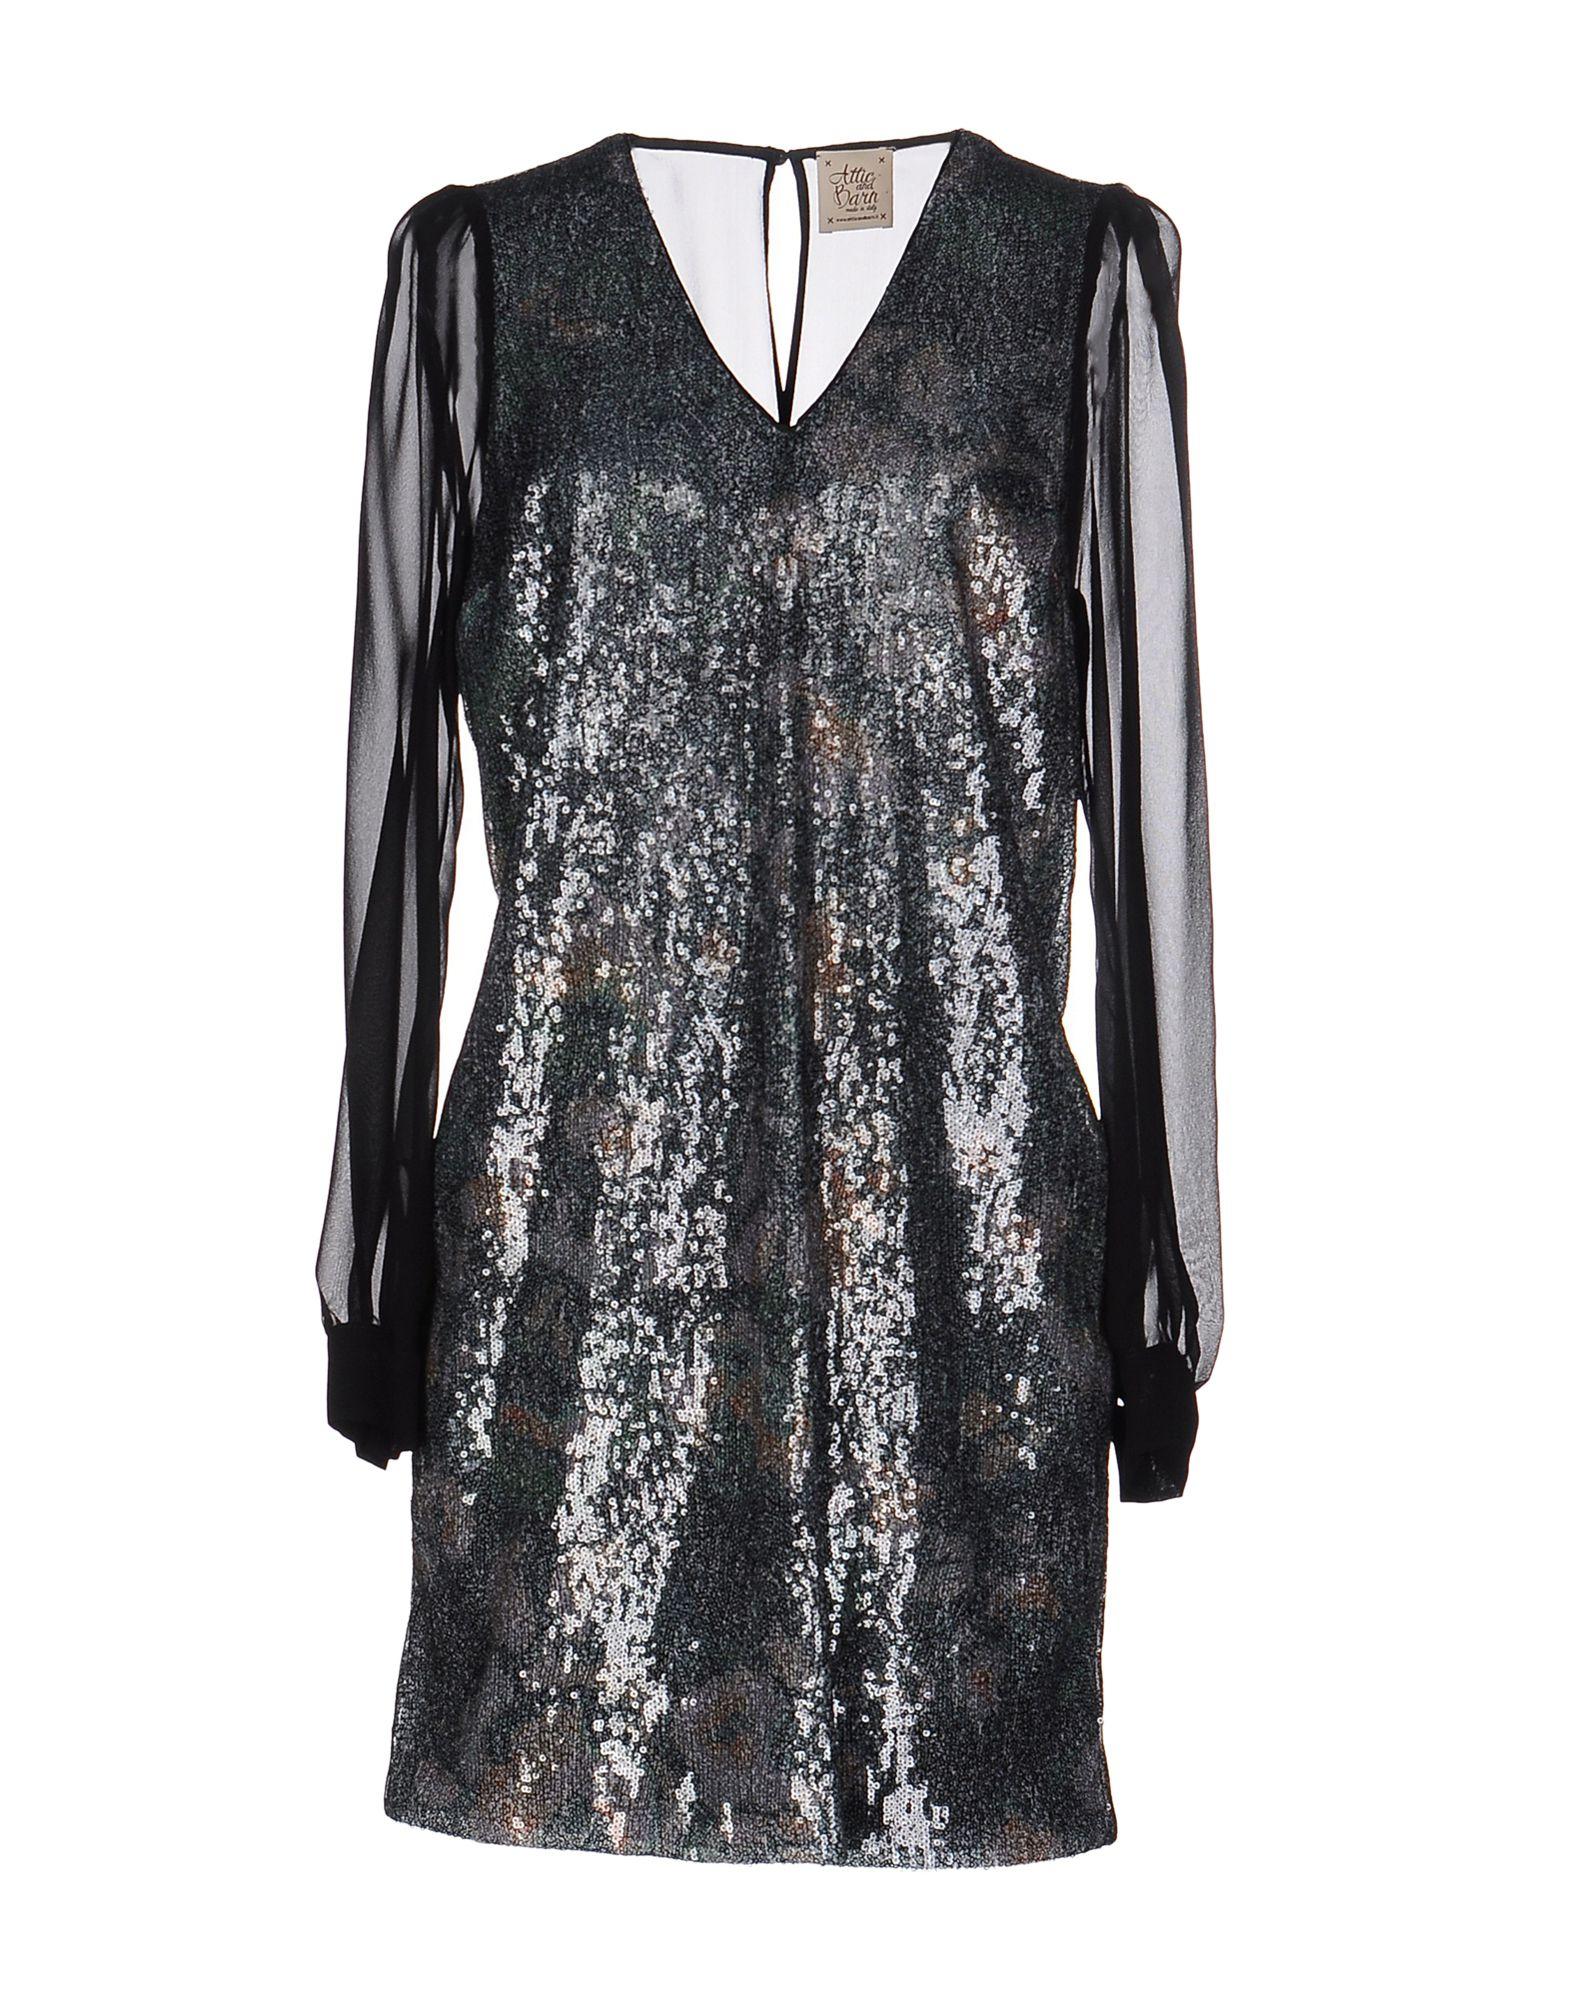 ATTIC AND BARN Короткое платье